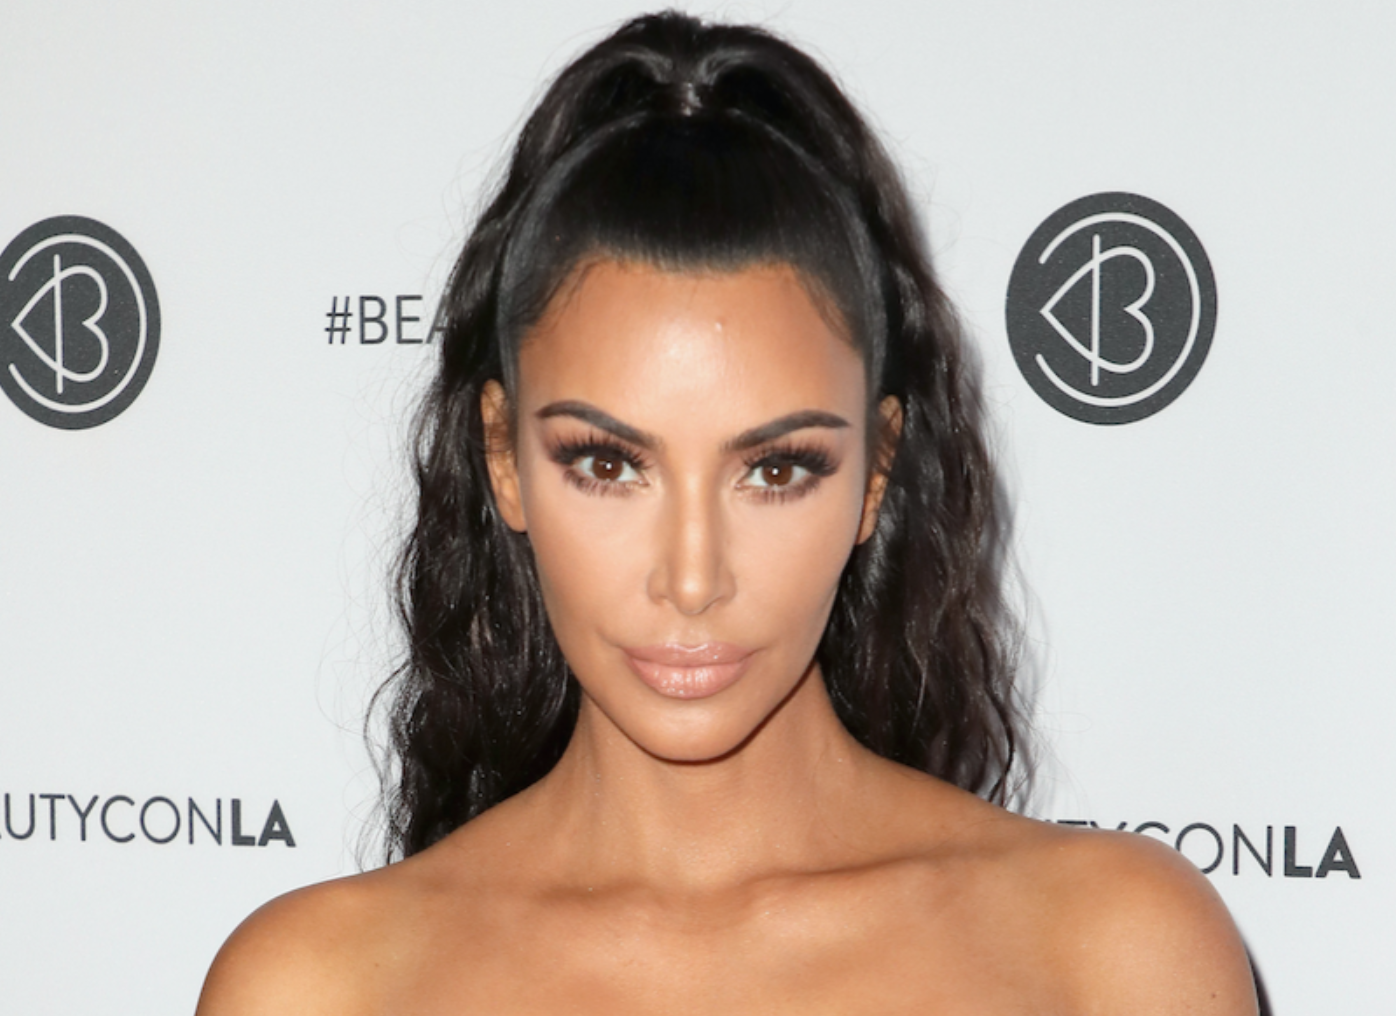 Kim Kardashian Stands By Harsh Critique of Kourtney Kardashian